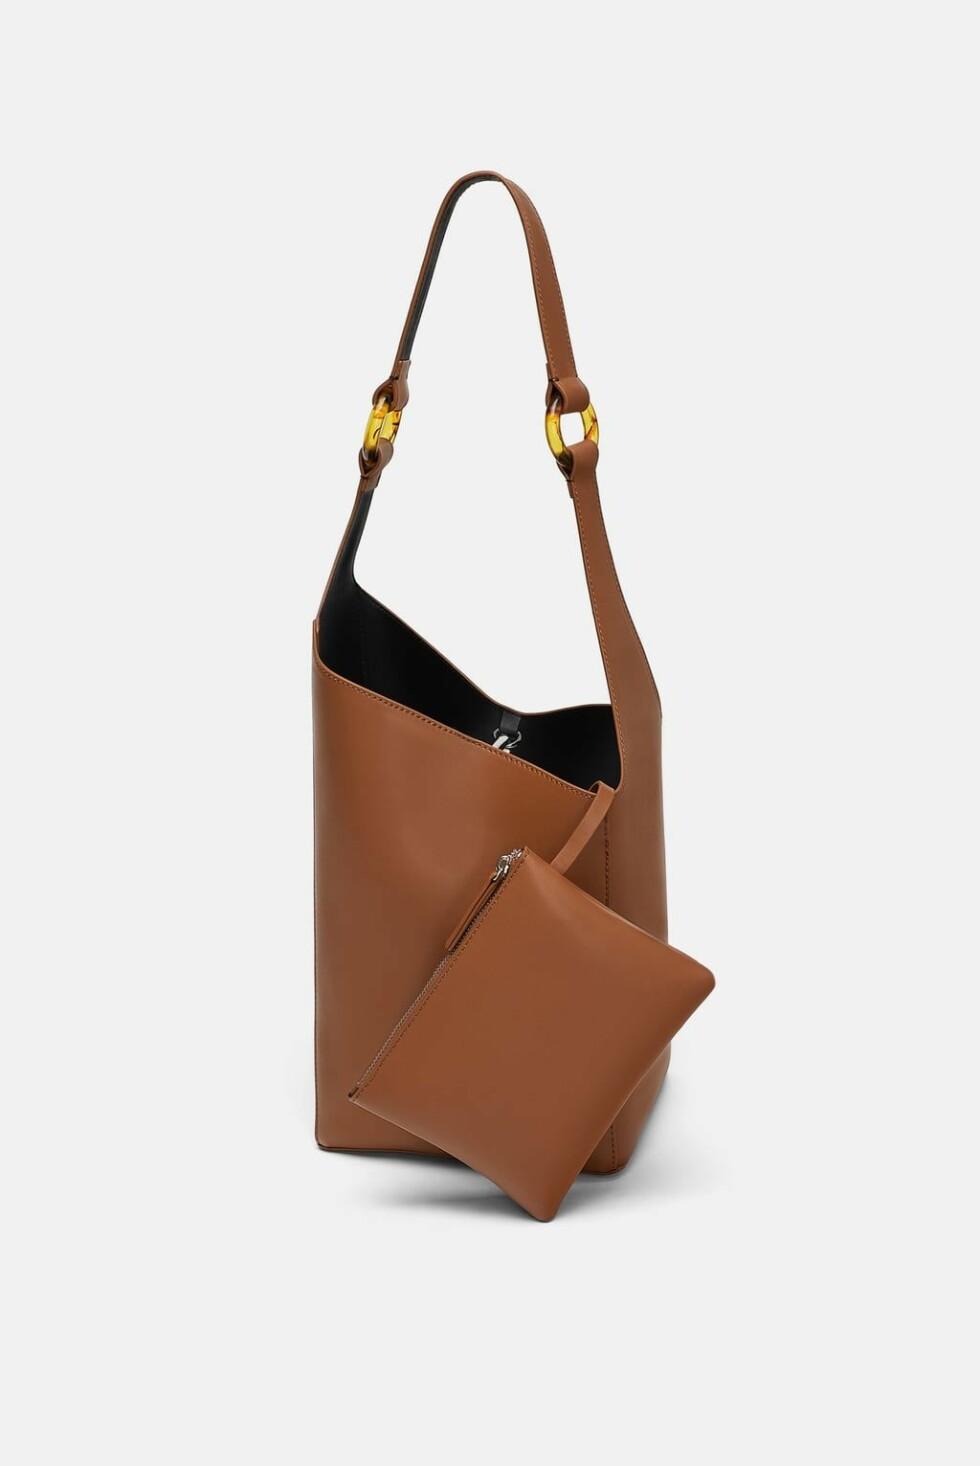 <strong>Veske fra Zara |499,-| https:</strong>//www.zara.com/no/no/poseveske-med-h%C3%A5ndtak-med-detalj-p15050304.html?v1=6963684&v2=1074708